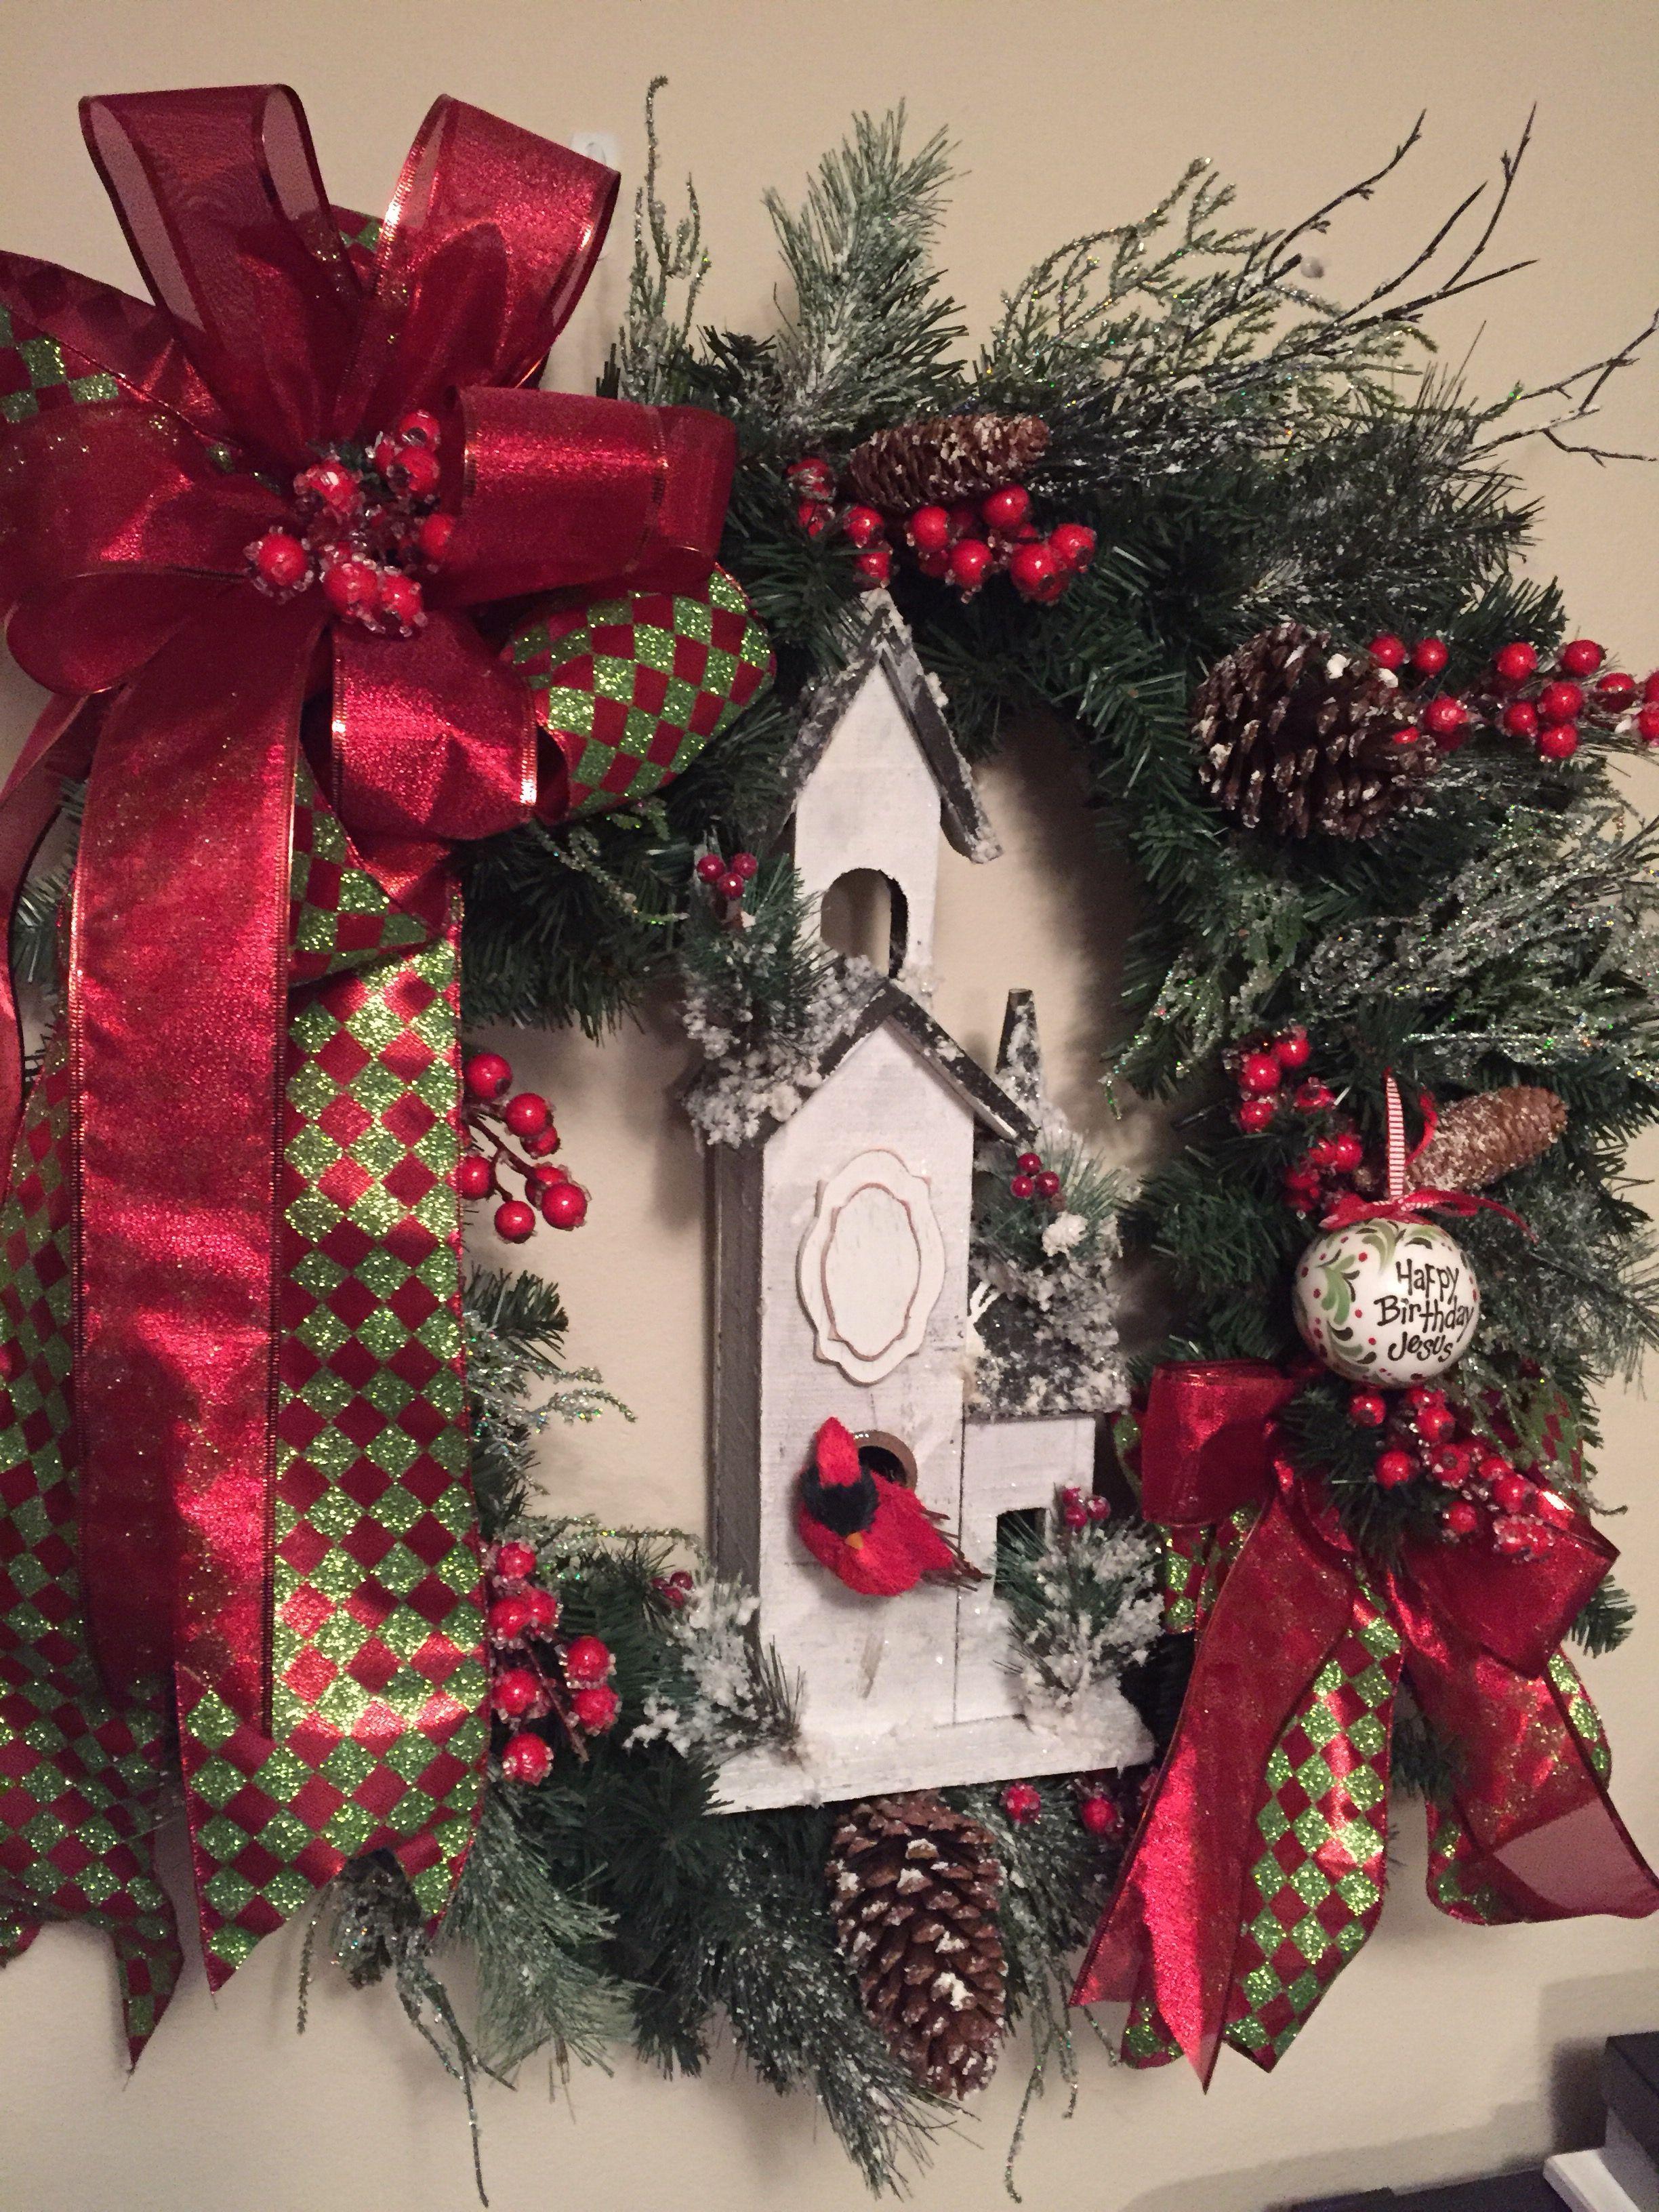 Happy Birthday Jesus! Christmas decorations, Christmas